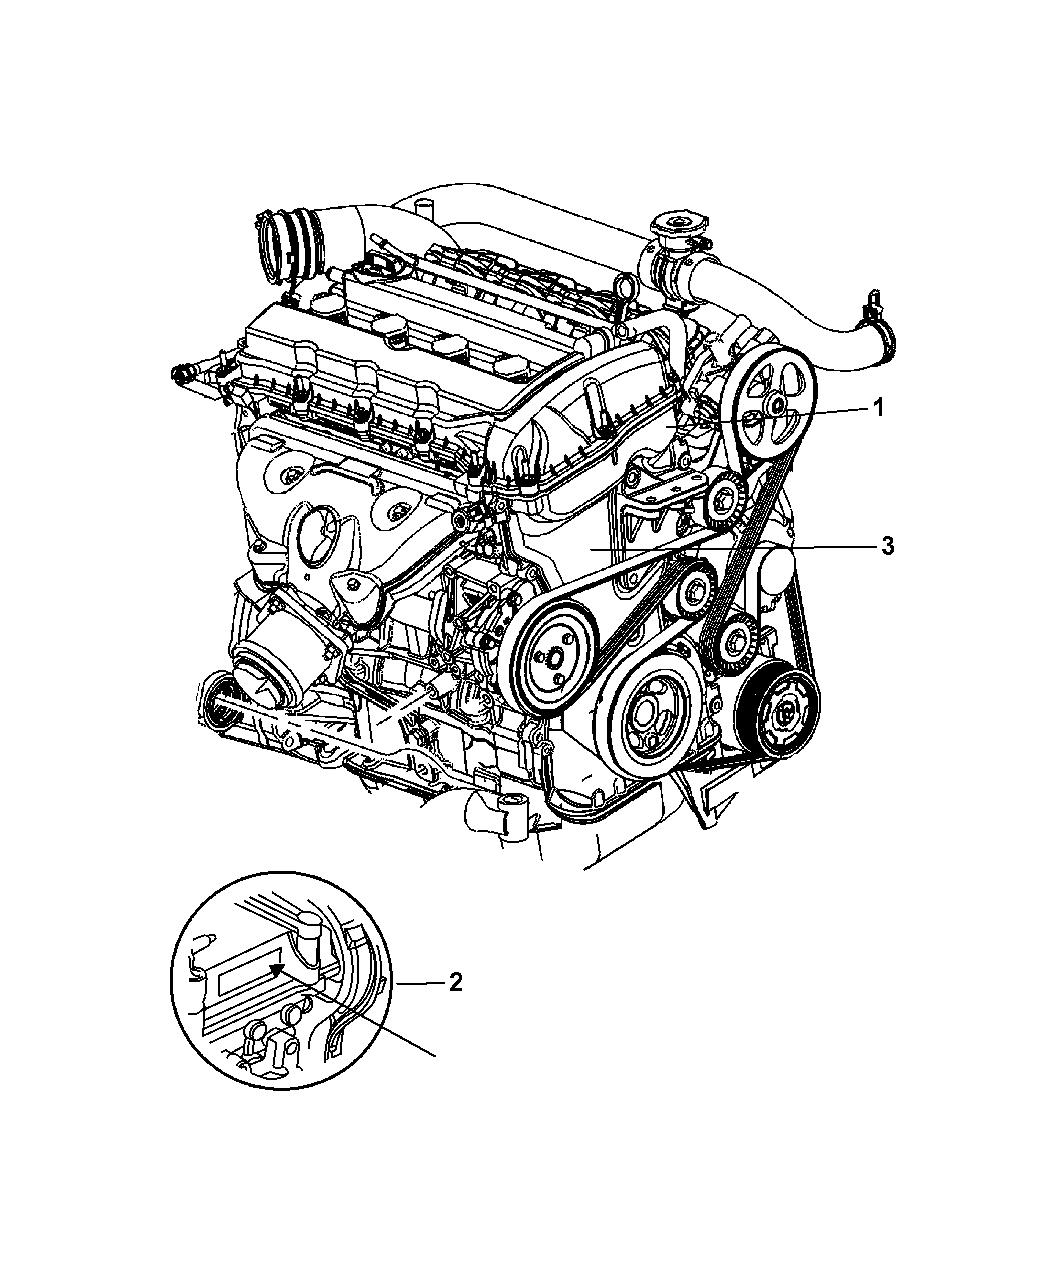 2009 Dodge Avenger Engine Assembly & Service